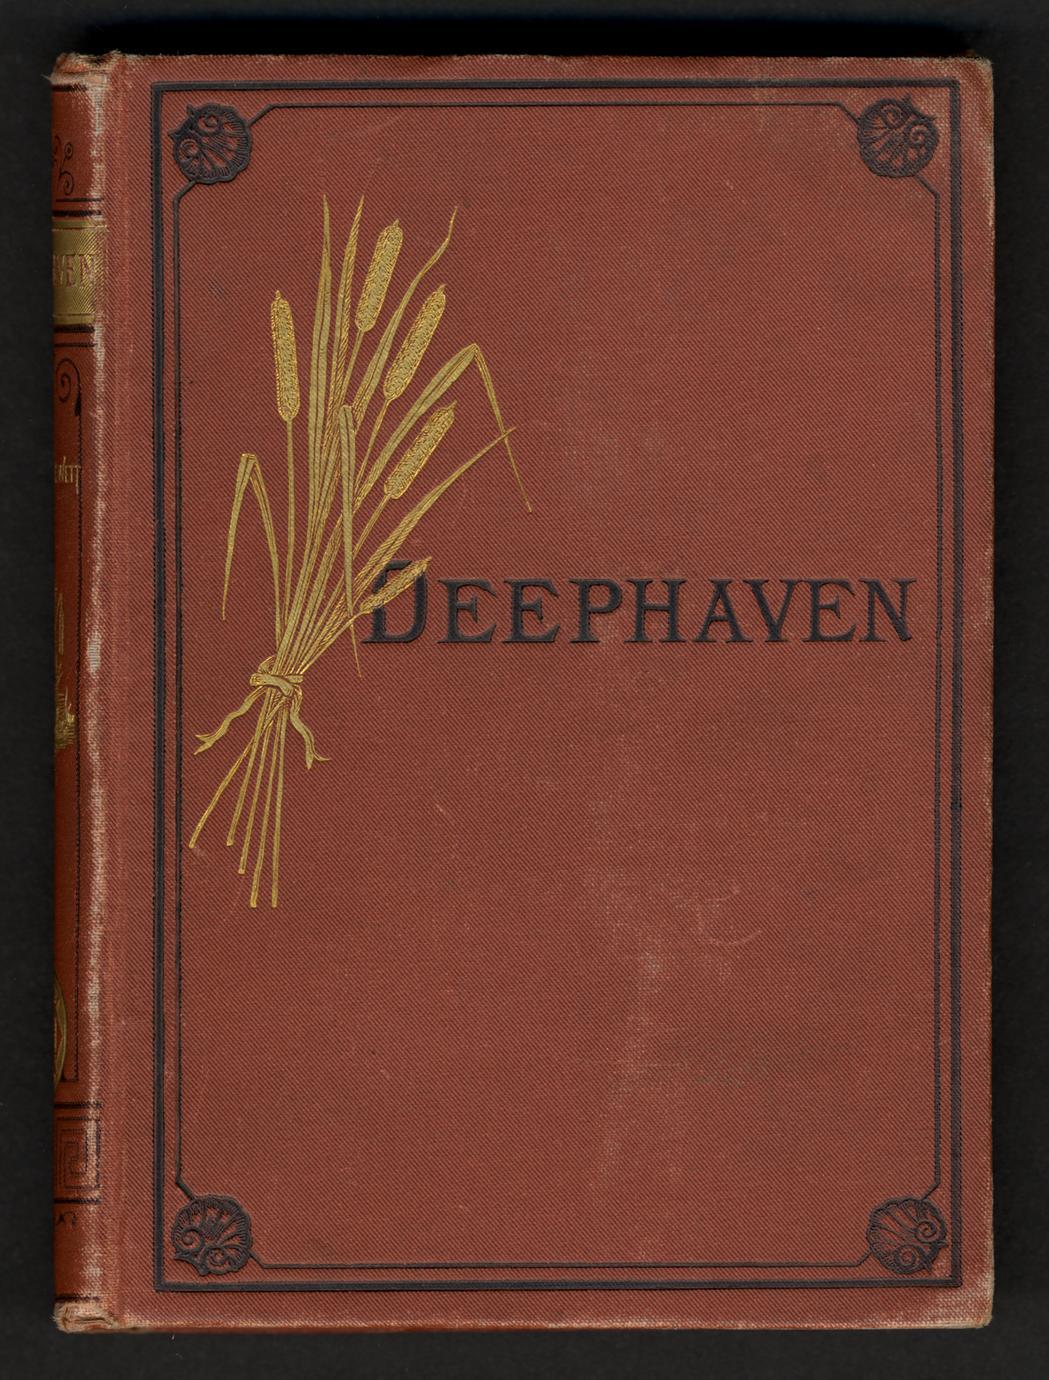 Deephaven (1 of 2)